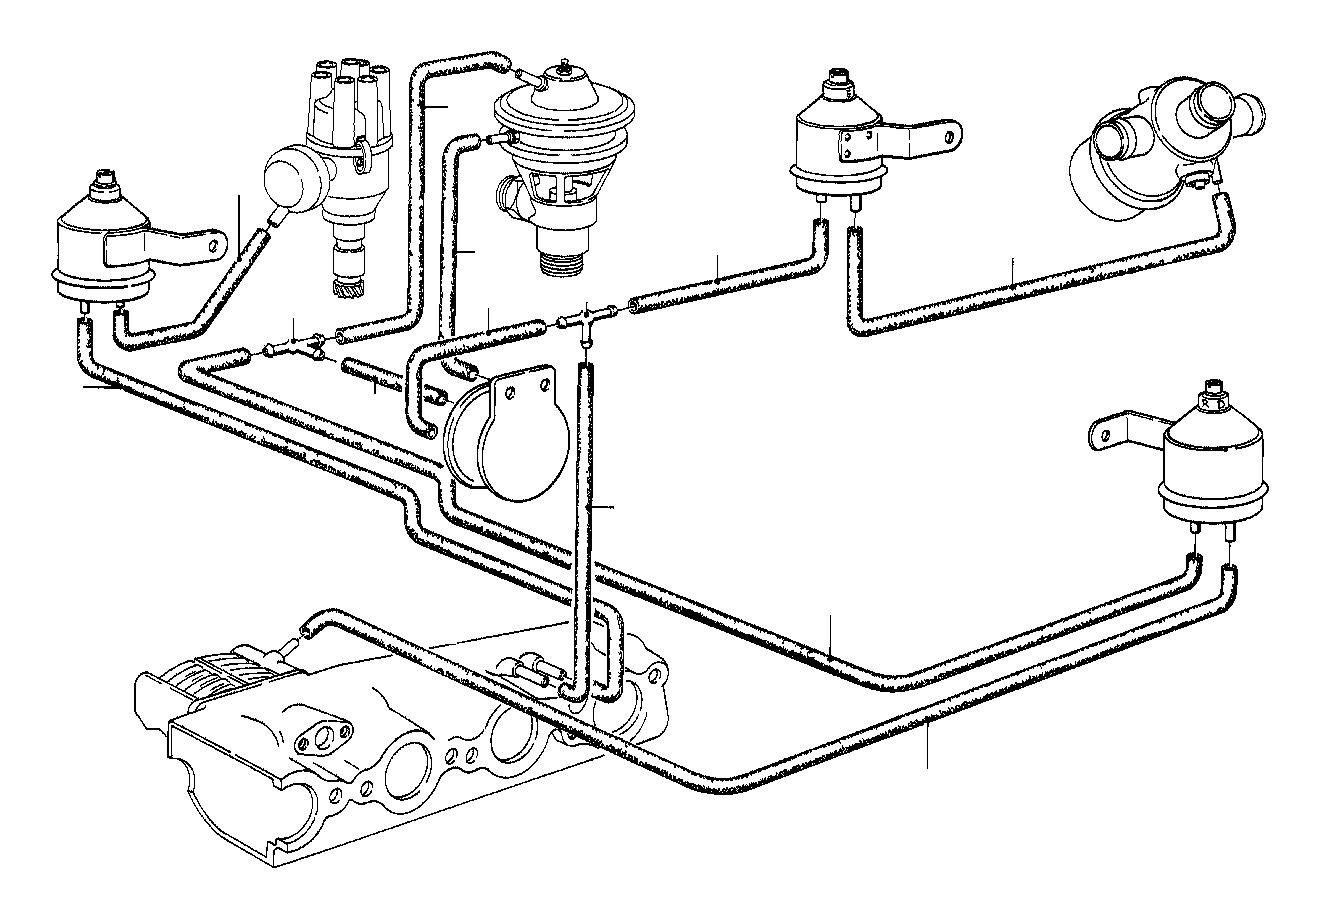 Bmw M10 Engine Diagram Bmw Wiring Diagram Images